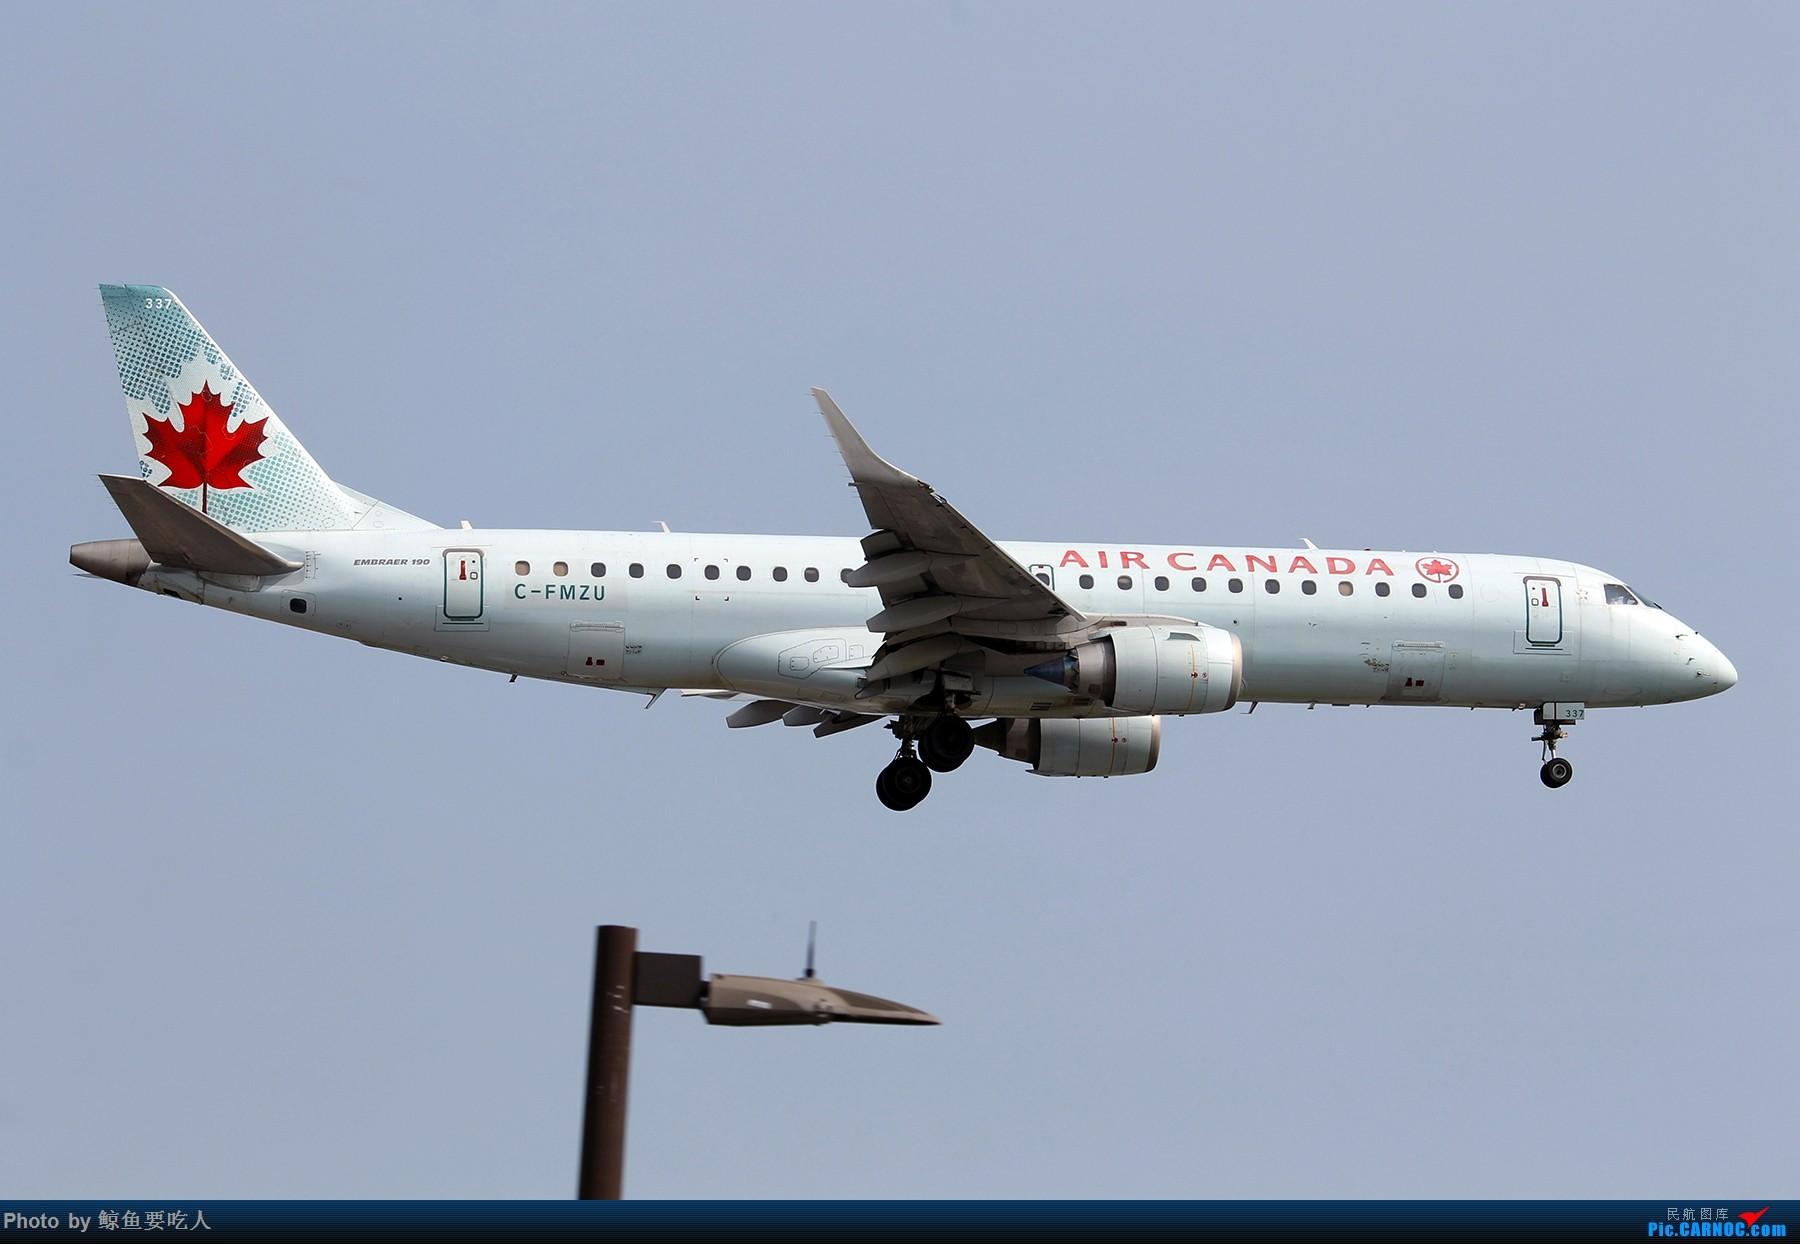 Re:[原创][Steven@YYZ] 多伦多皮尔逊国际机场晴天降落一组~~~ ERJ-190AR C-FMZU 多伦多皮尔逊国际机场